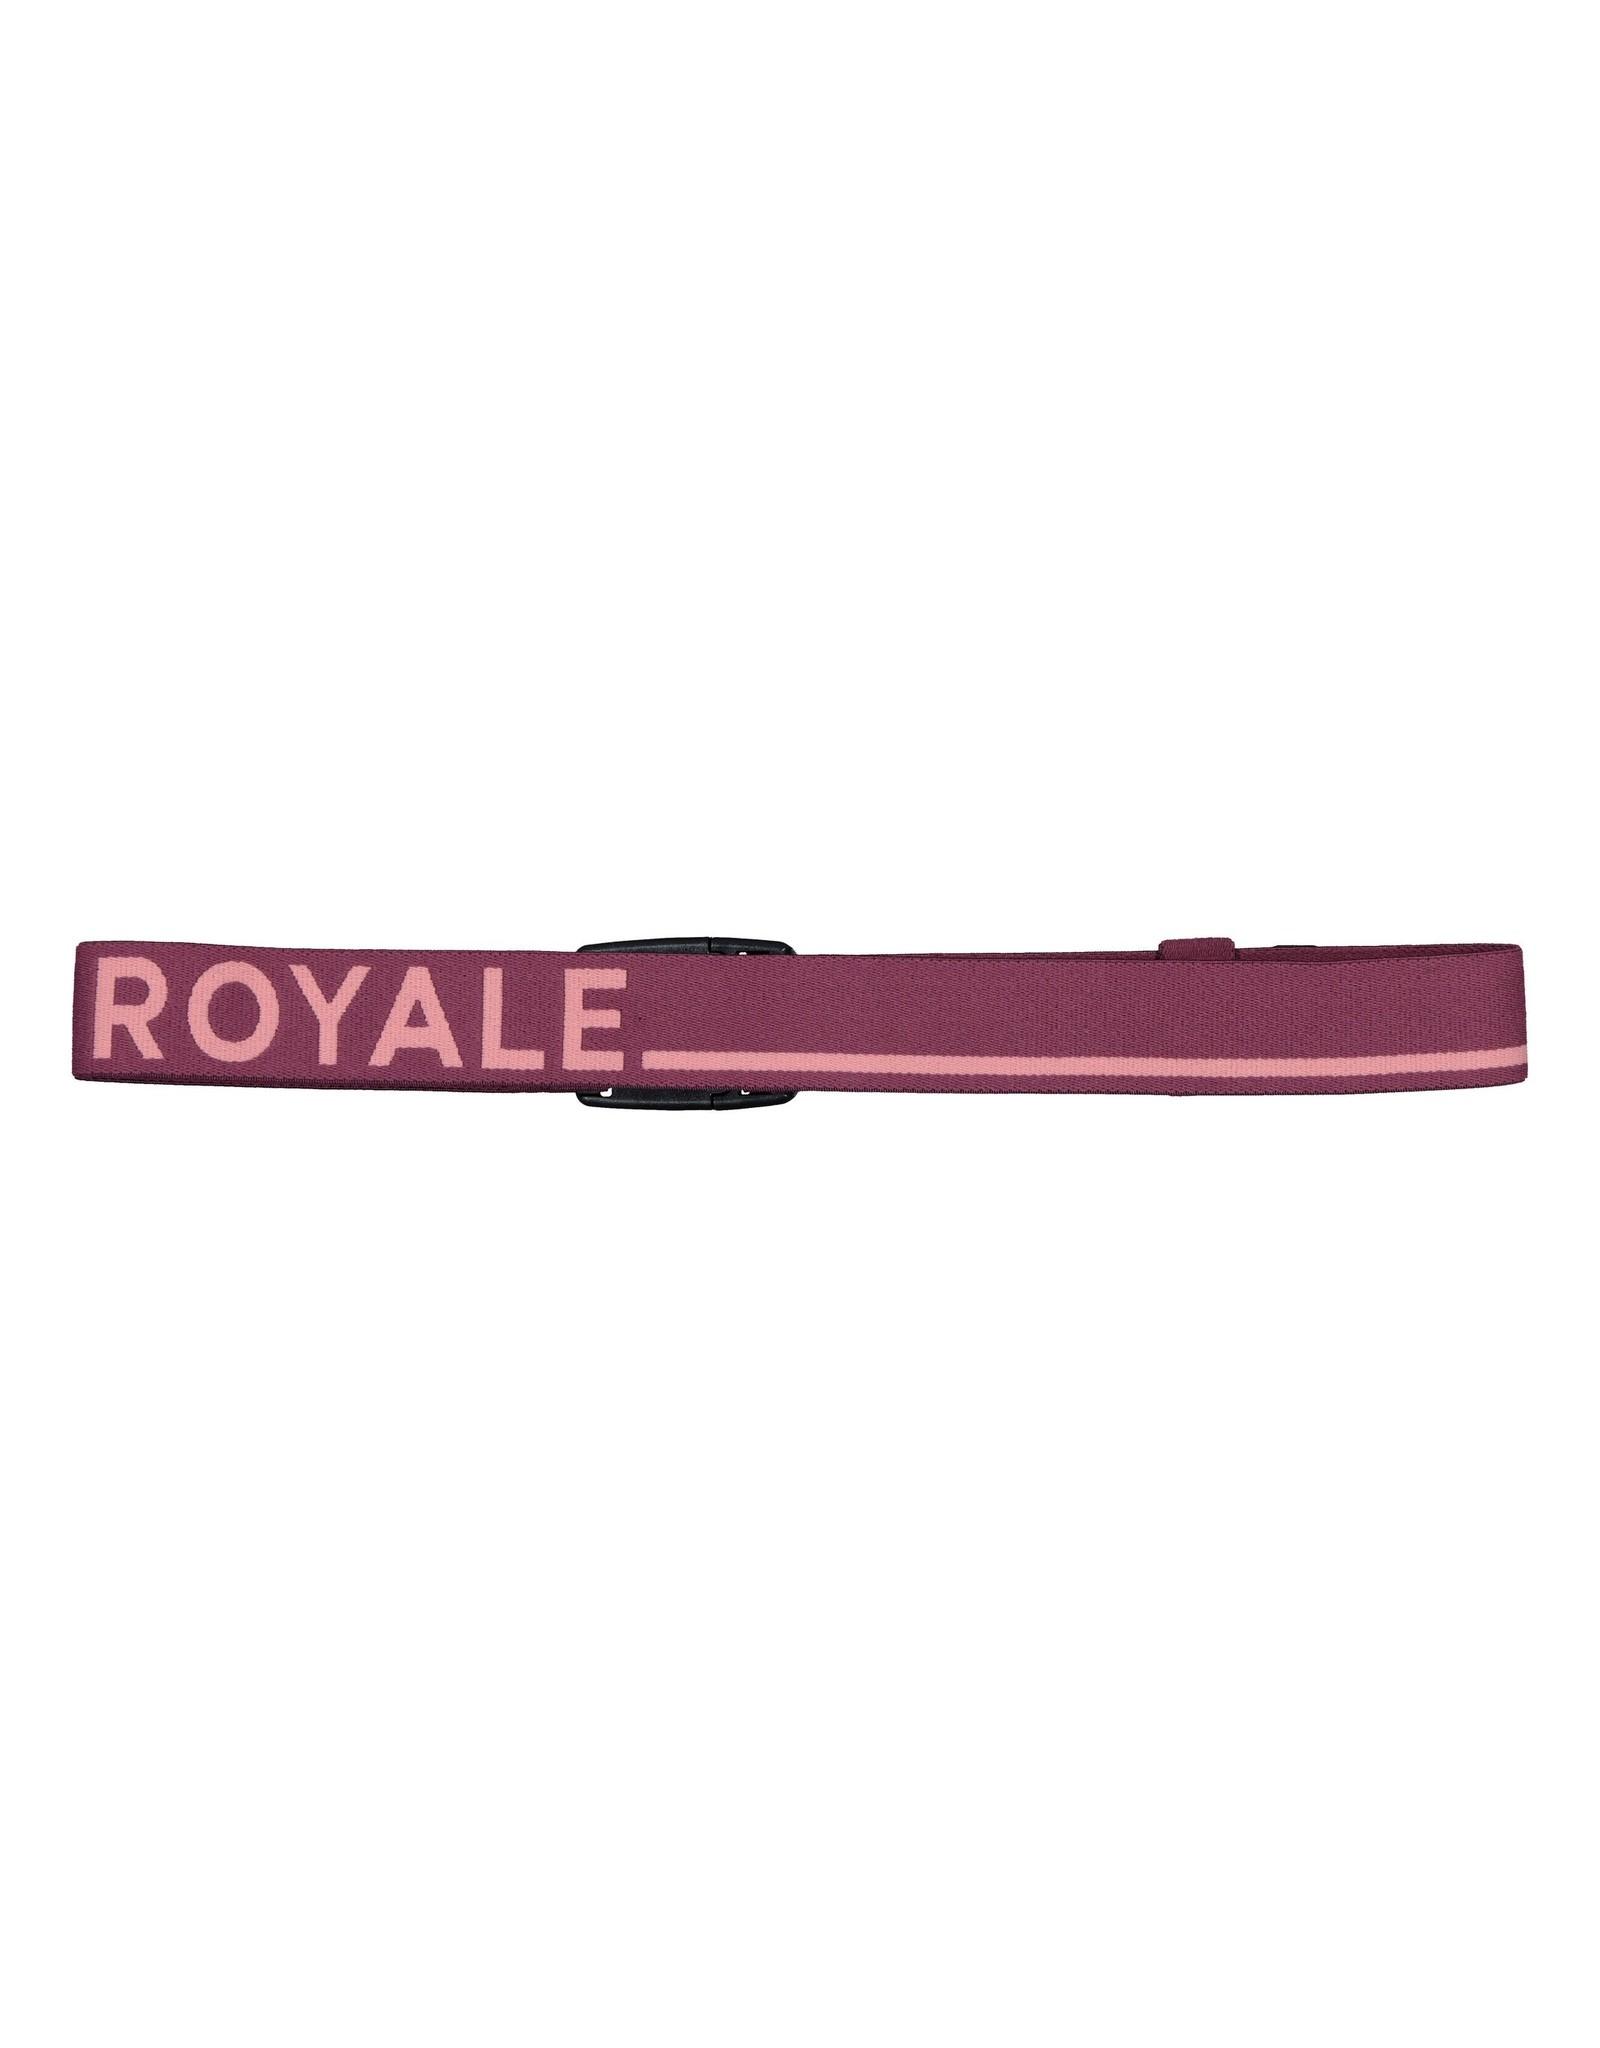 "Mons Royale Mons Royale ""Mons"" Belt -S2020"